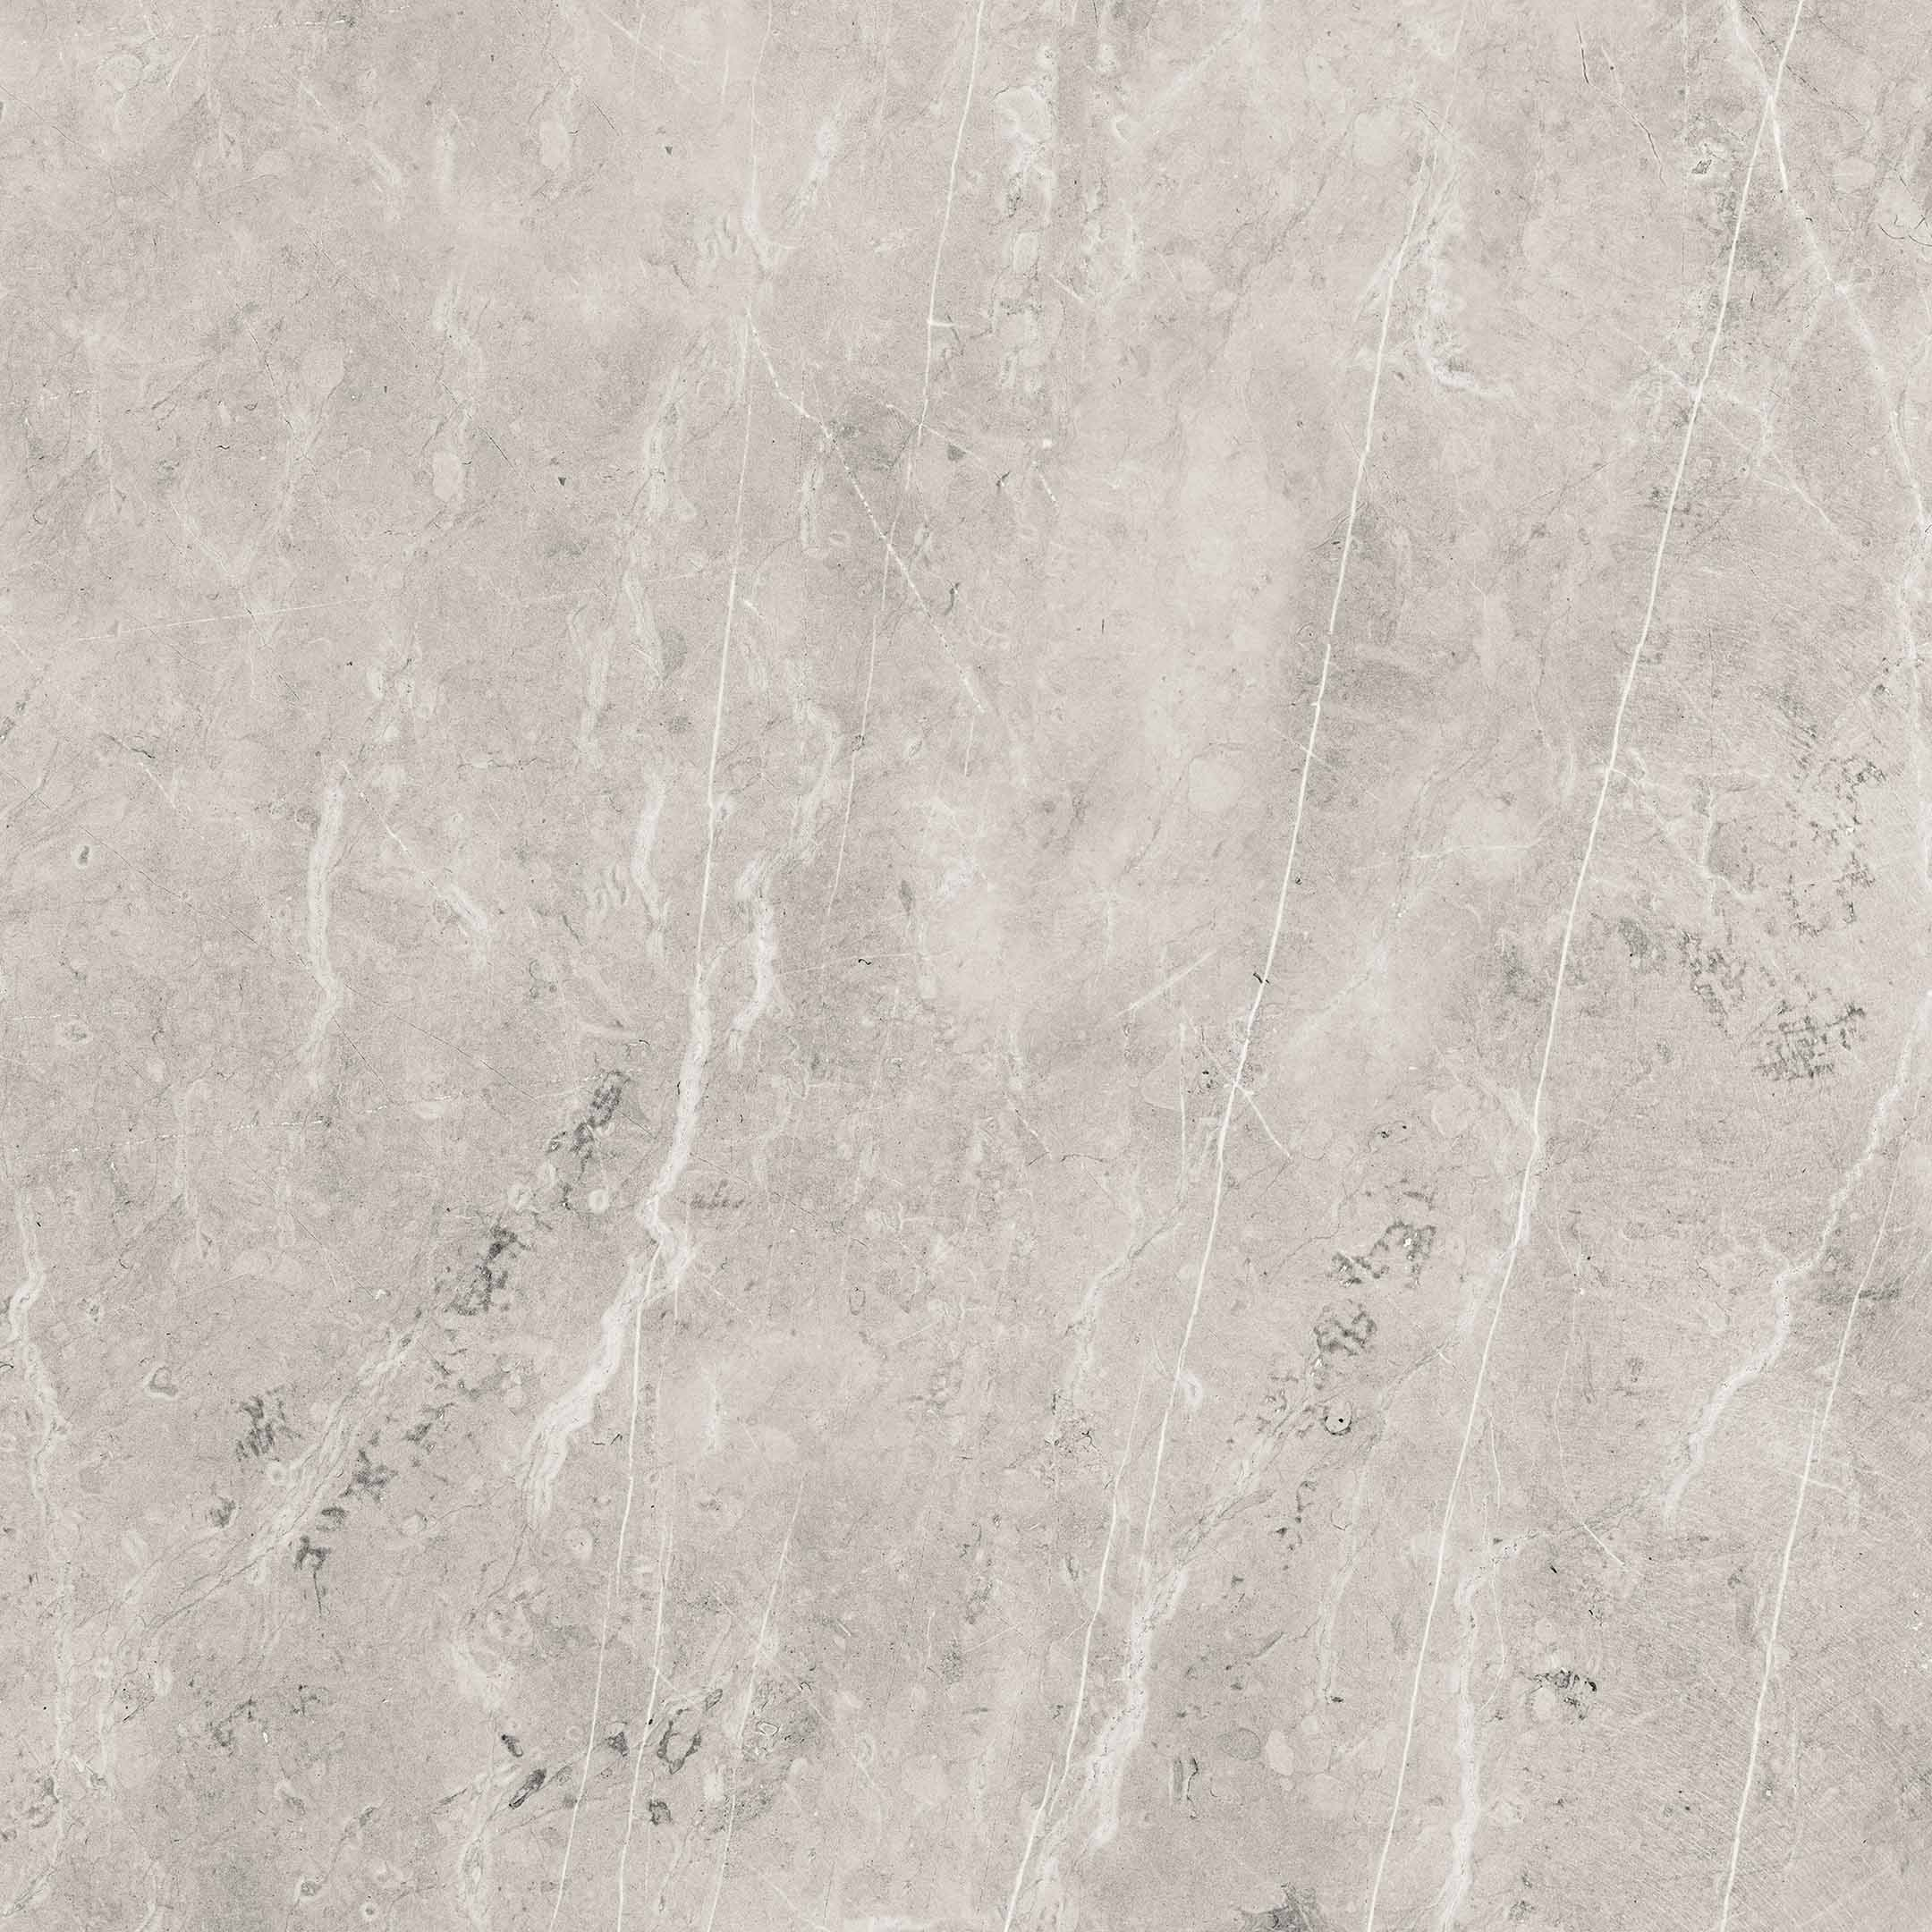 Керамогранит Estima Melody MO03 серый 405х405х8 мм (11 шт.=1,804 кв.м.)